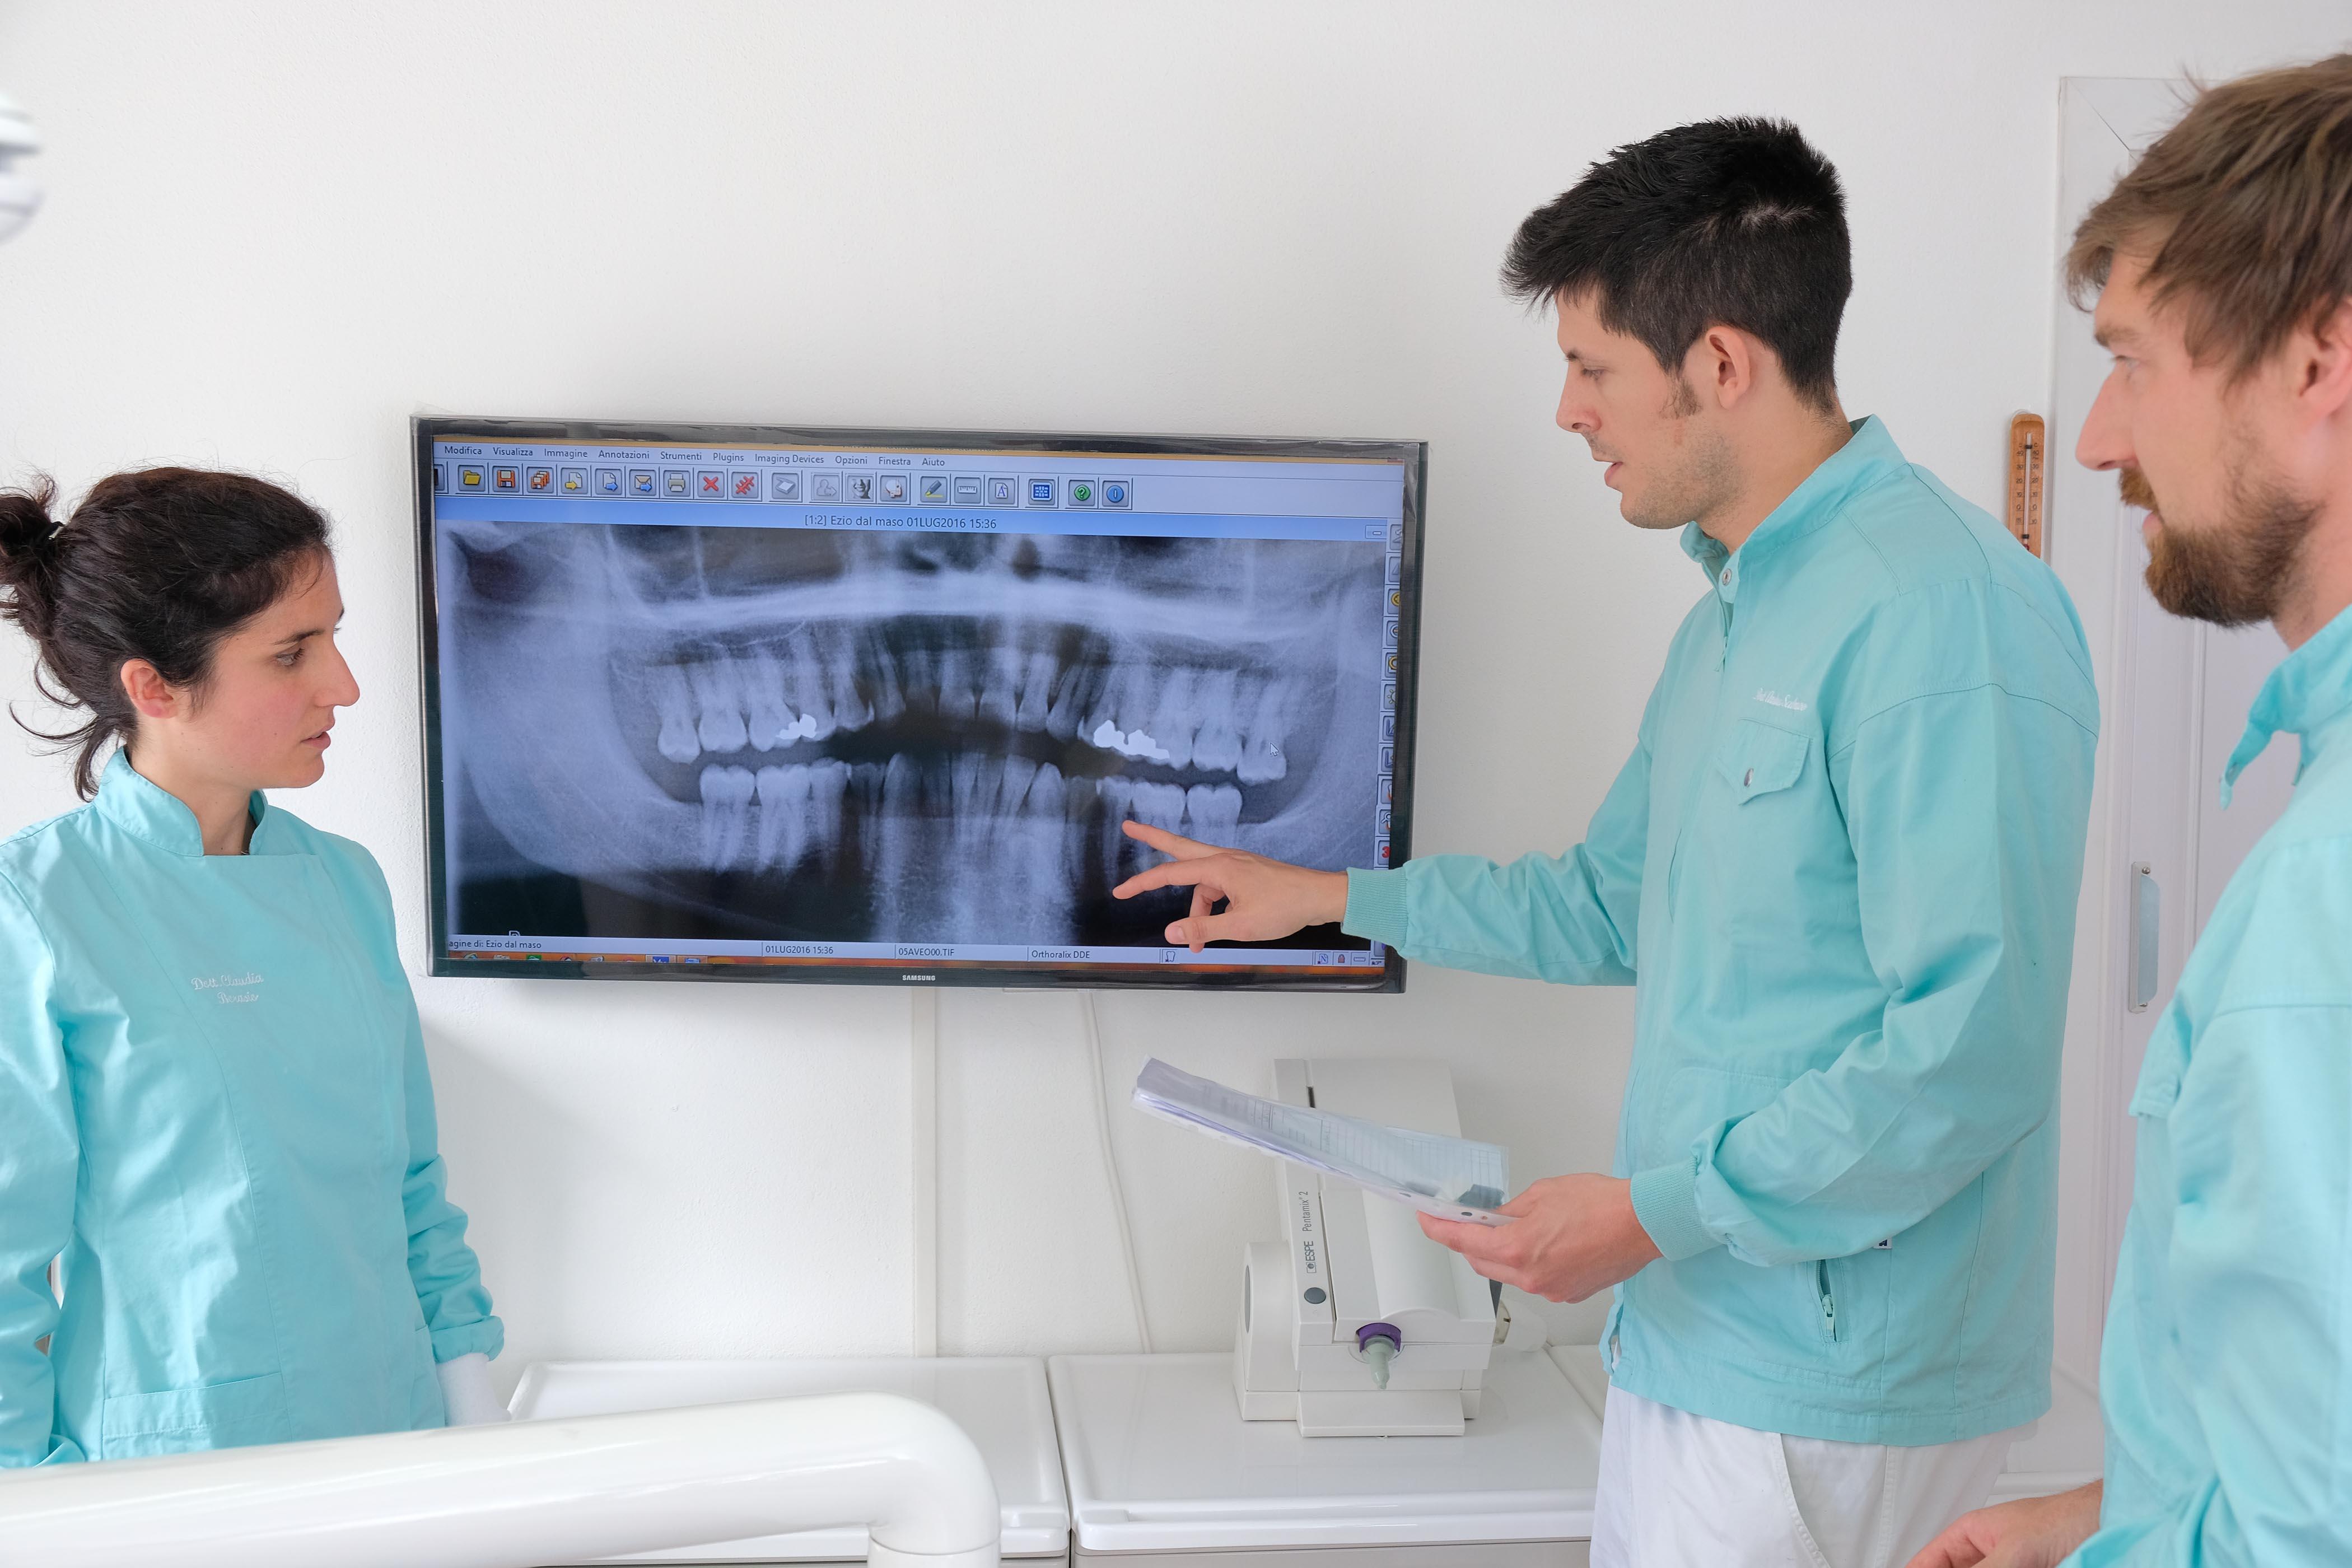 La Panoramica Dentale